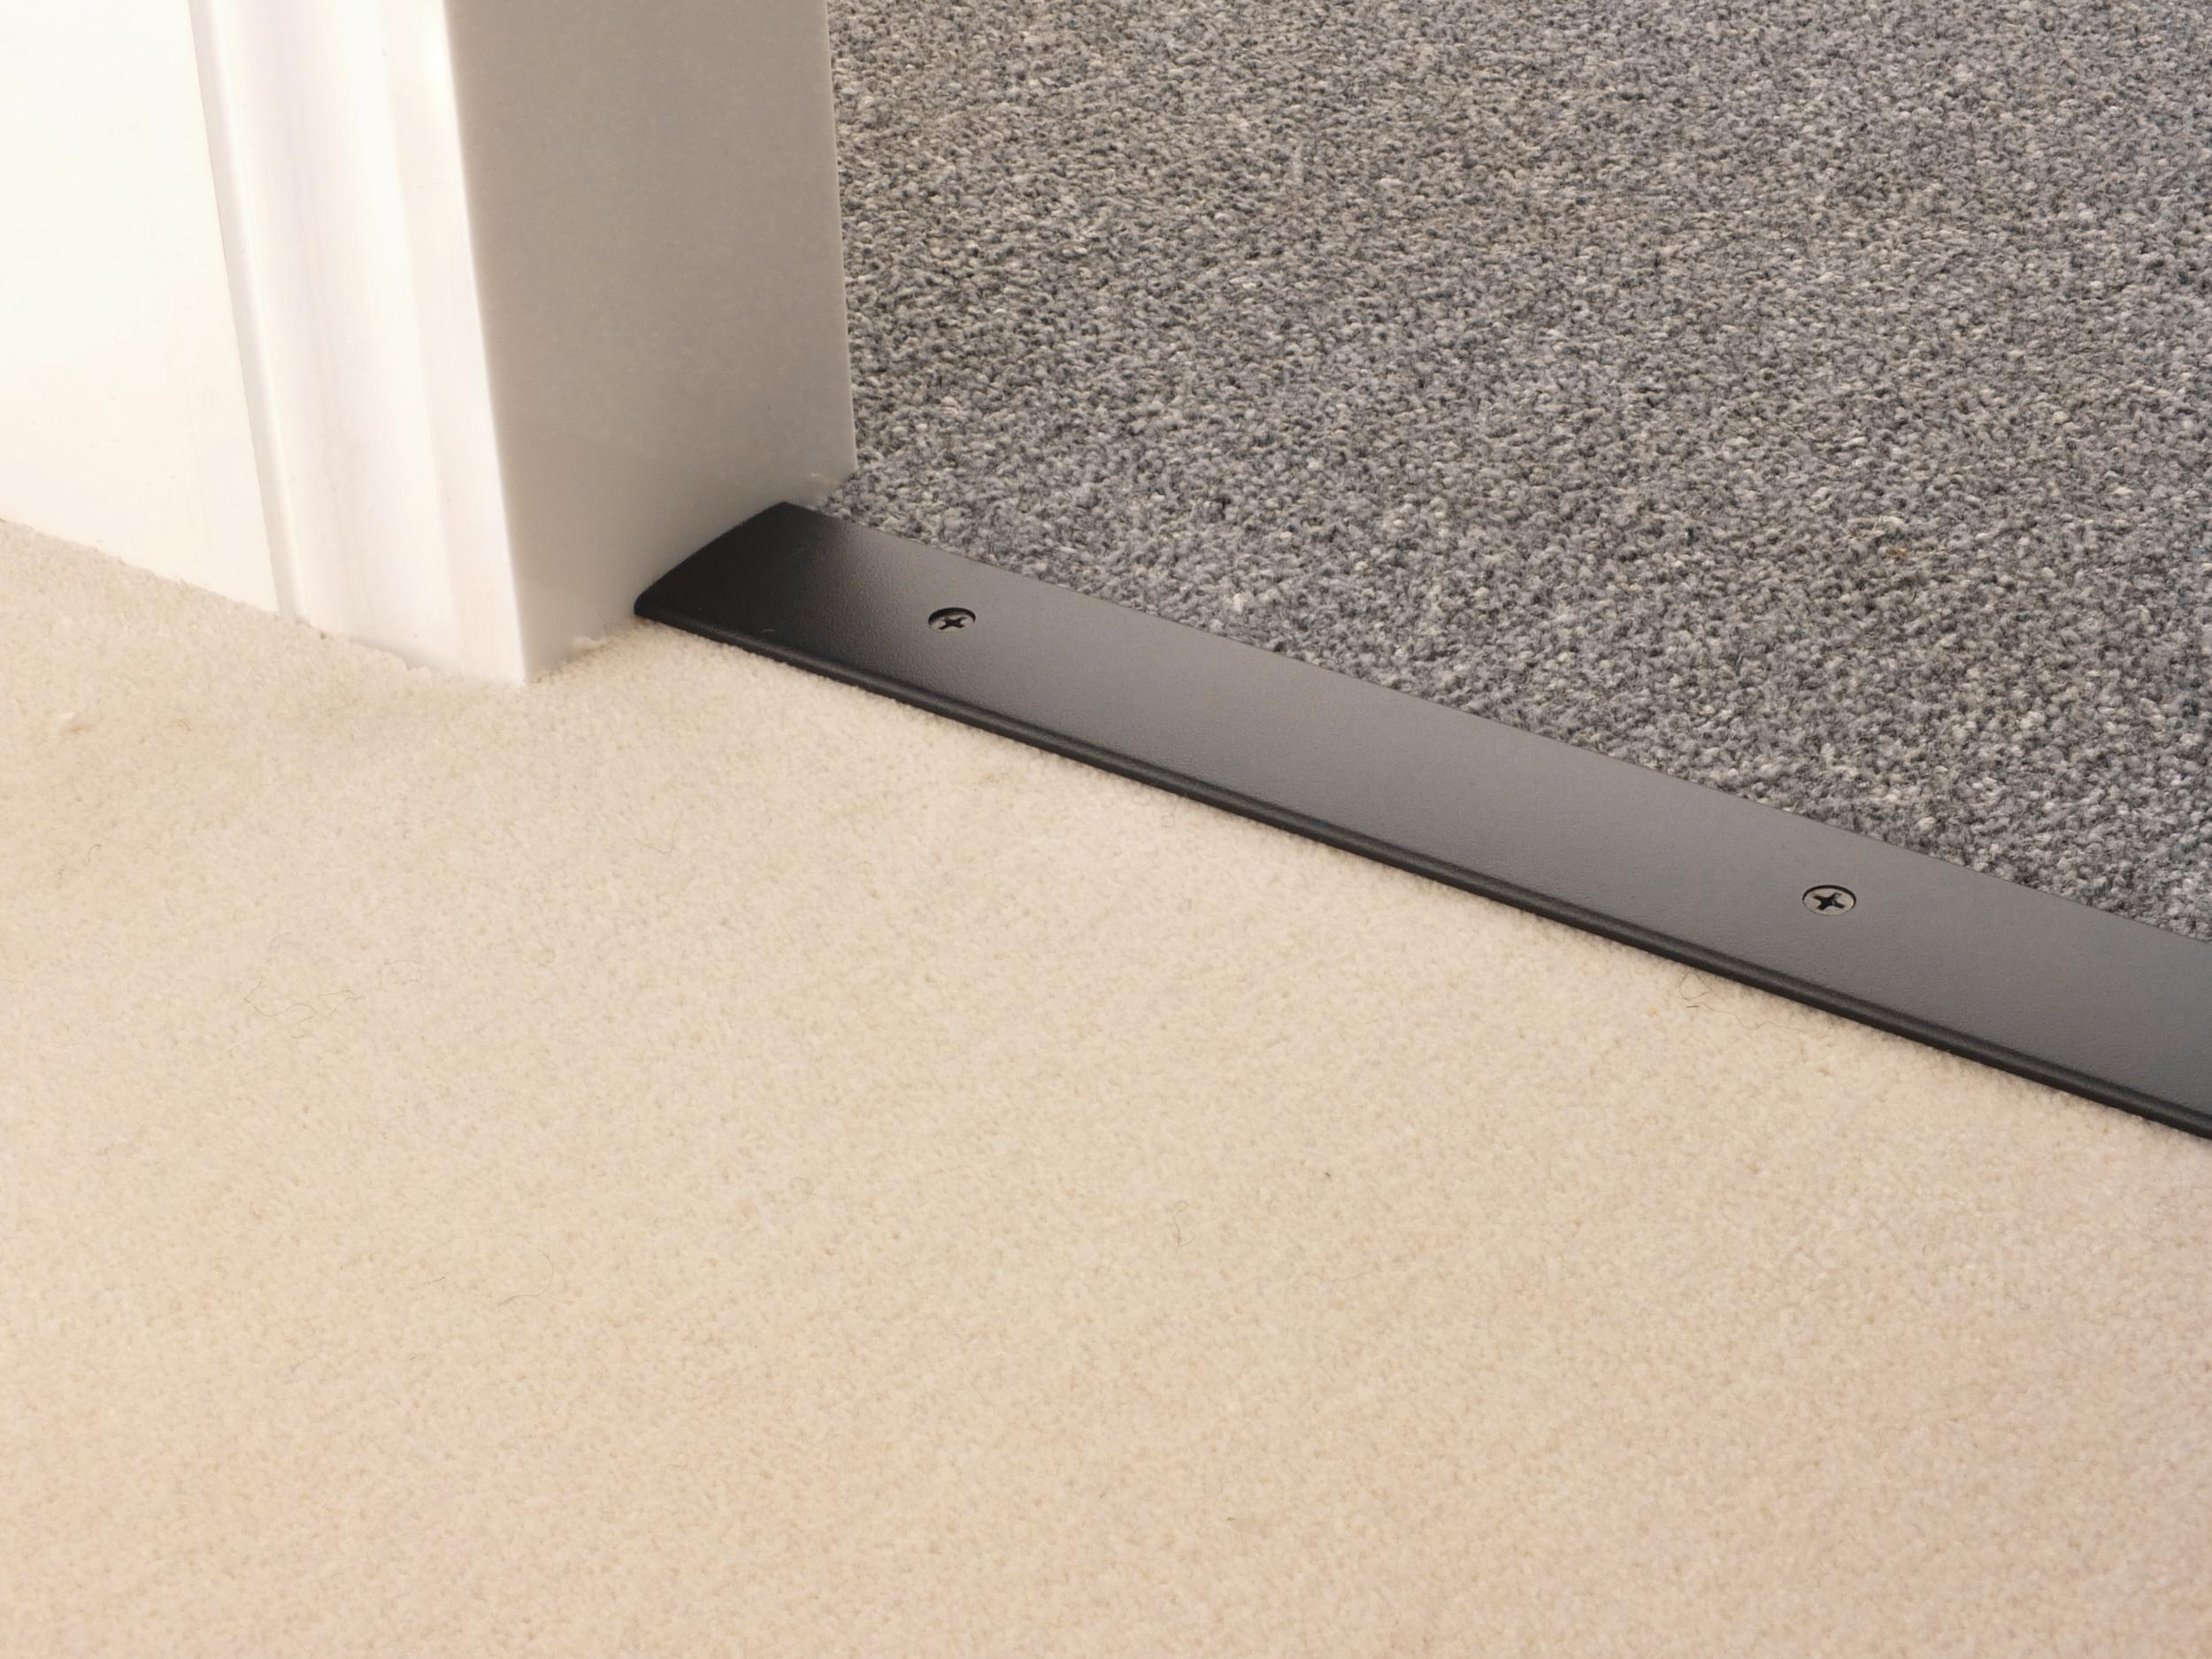 stairrods-doorbar-black-carpet-carpet.jpg